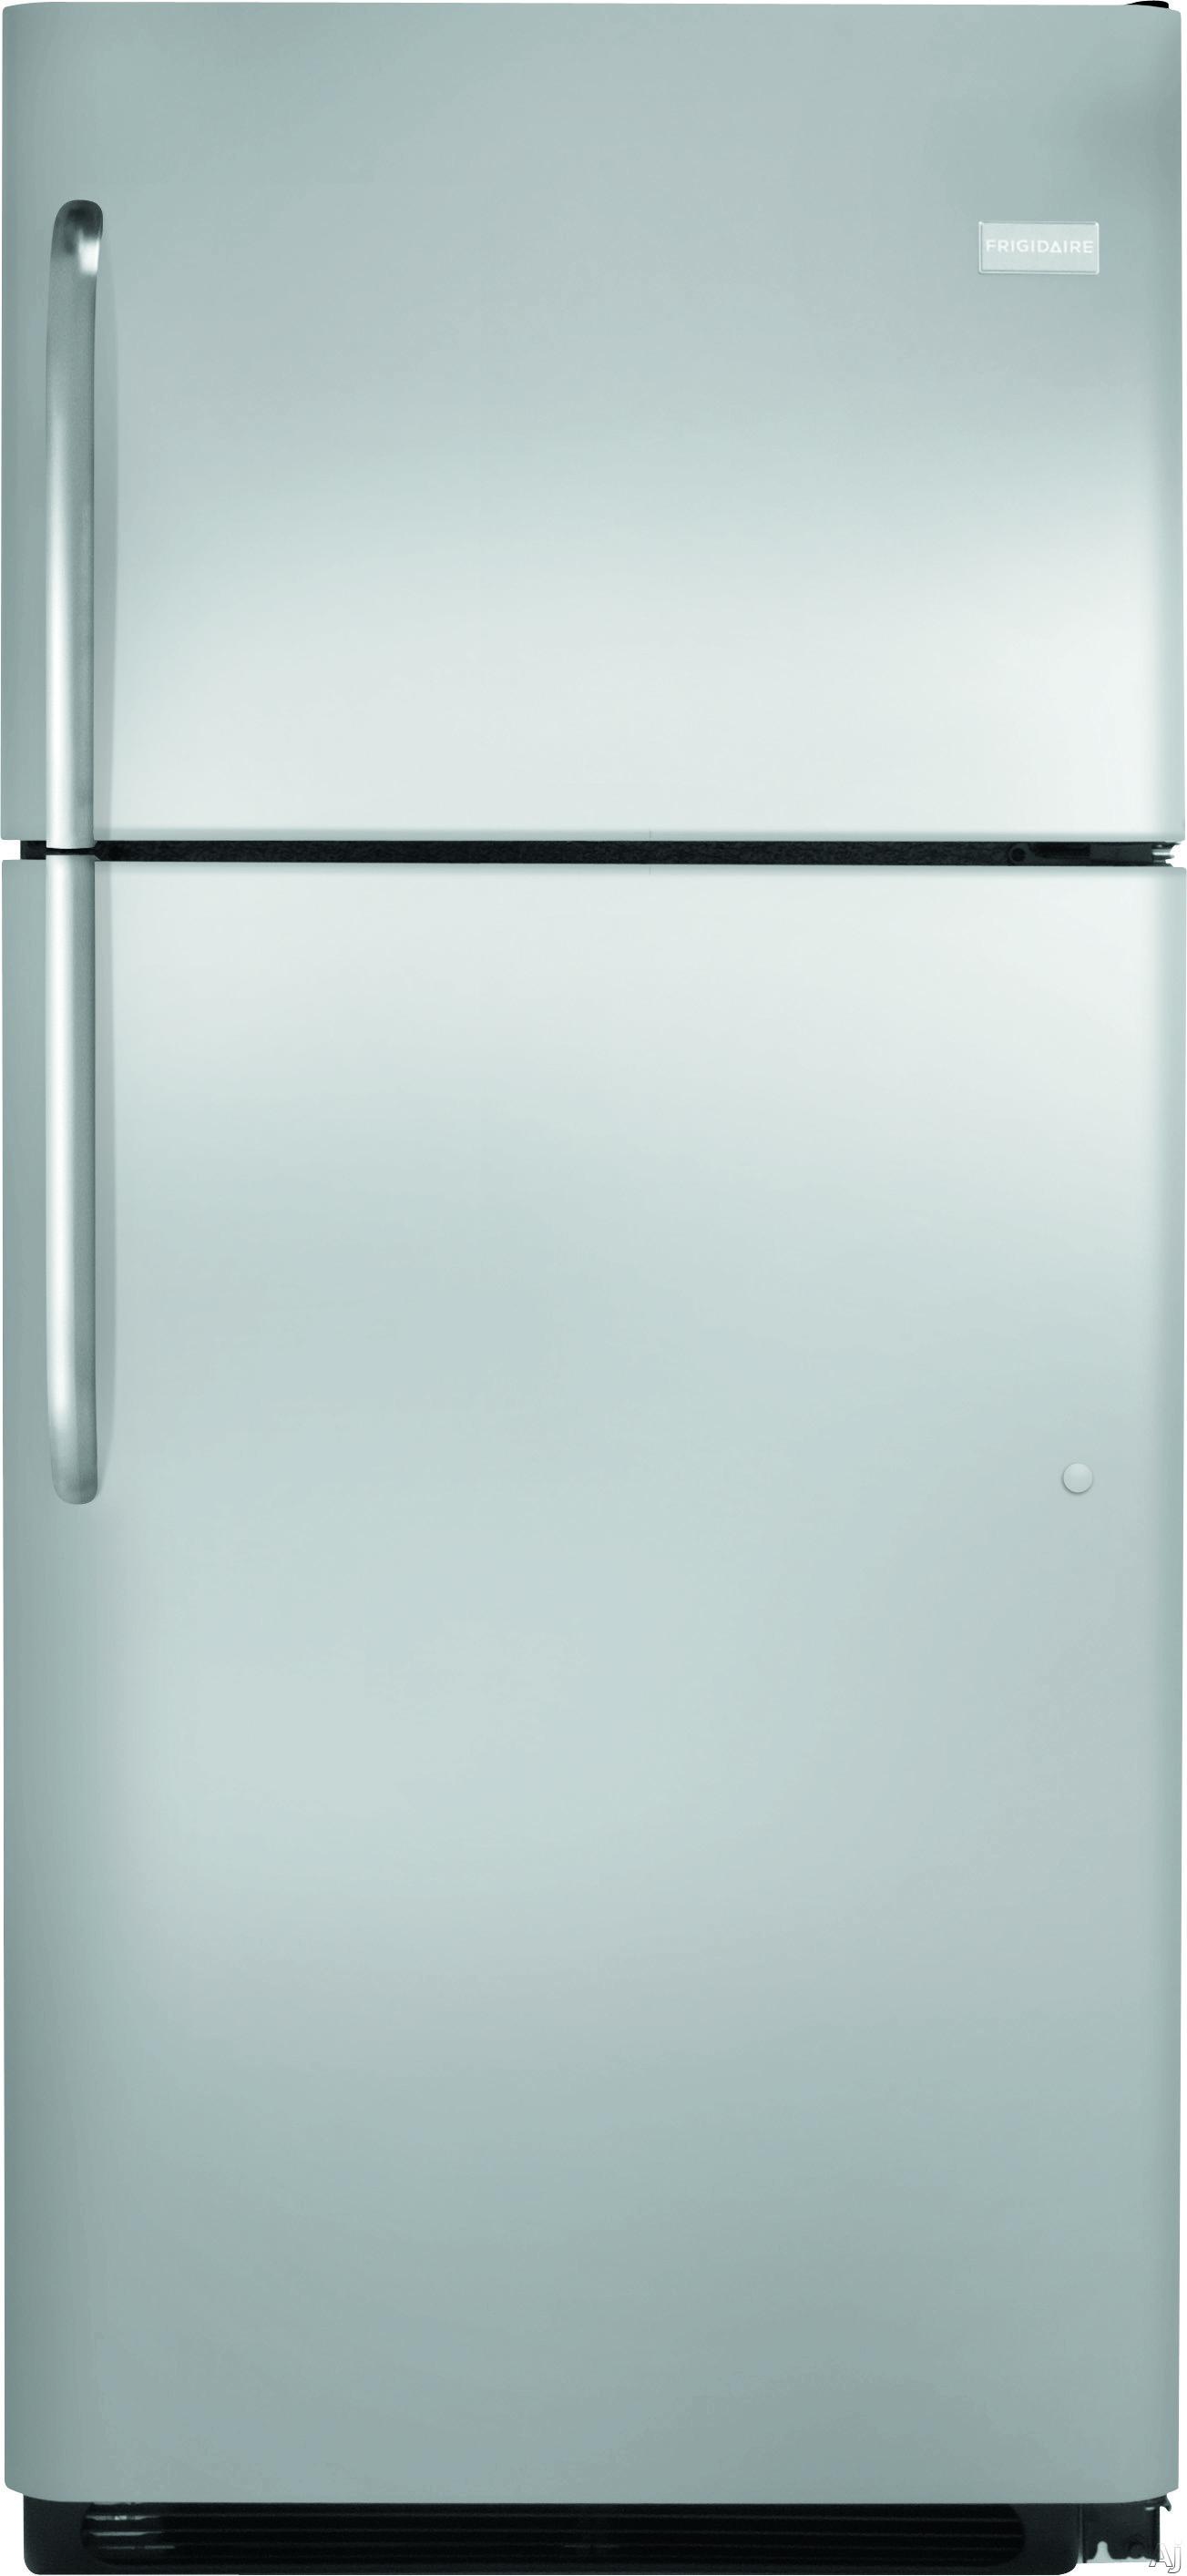 frigidaire ffht2021q 200 cu ft top freezer refrigerator. Black Bedroom Furniture Sets. Home Design Ideas